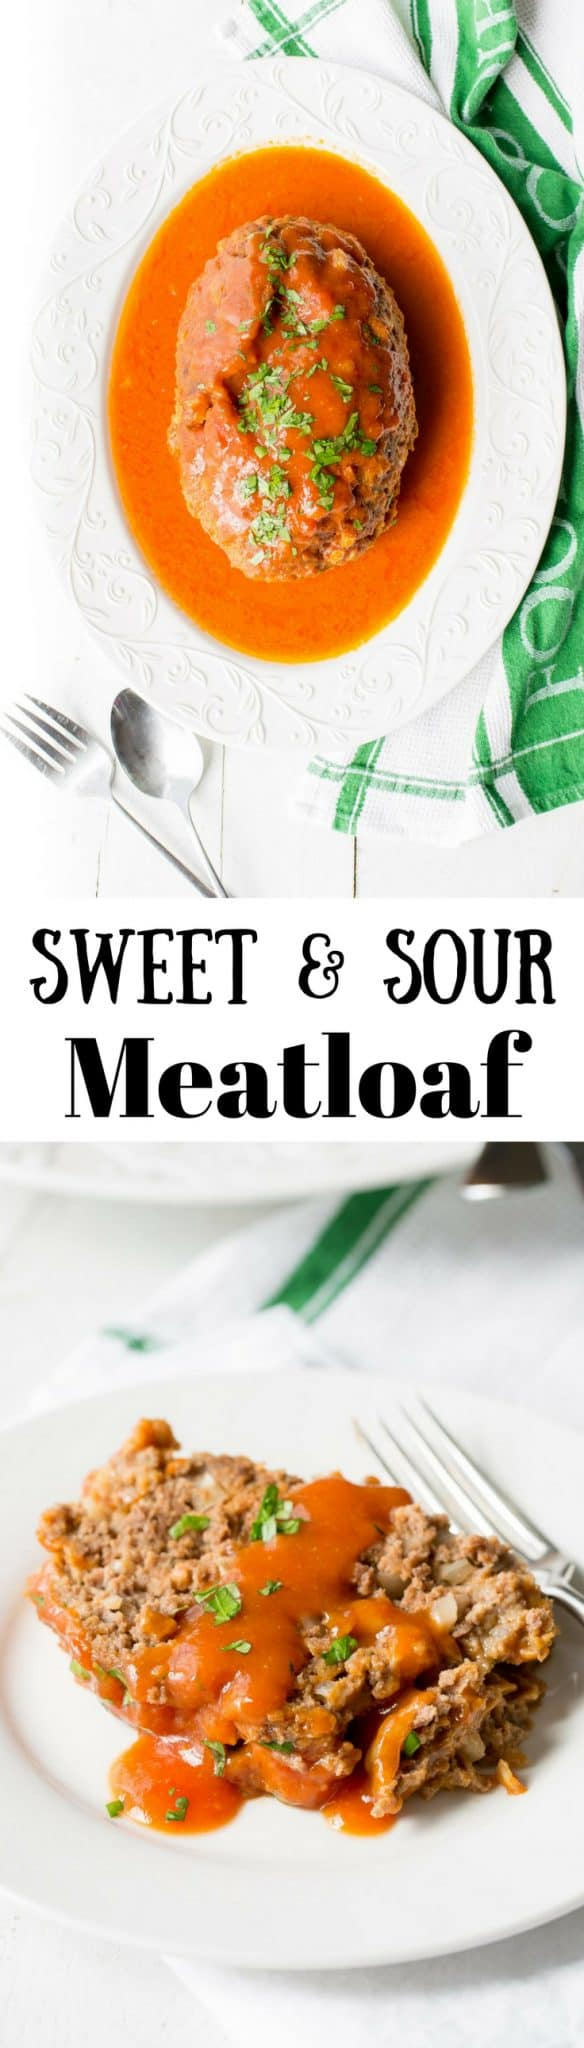 Sweet and Sour Meatloaf - Saving Room for Dessert